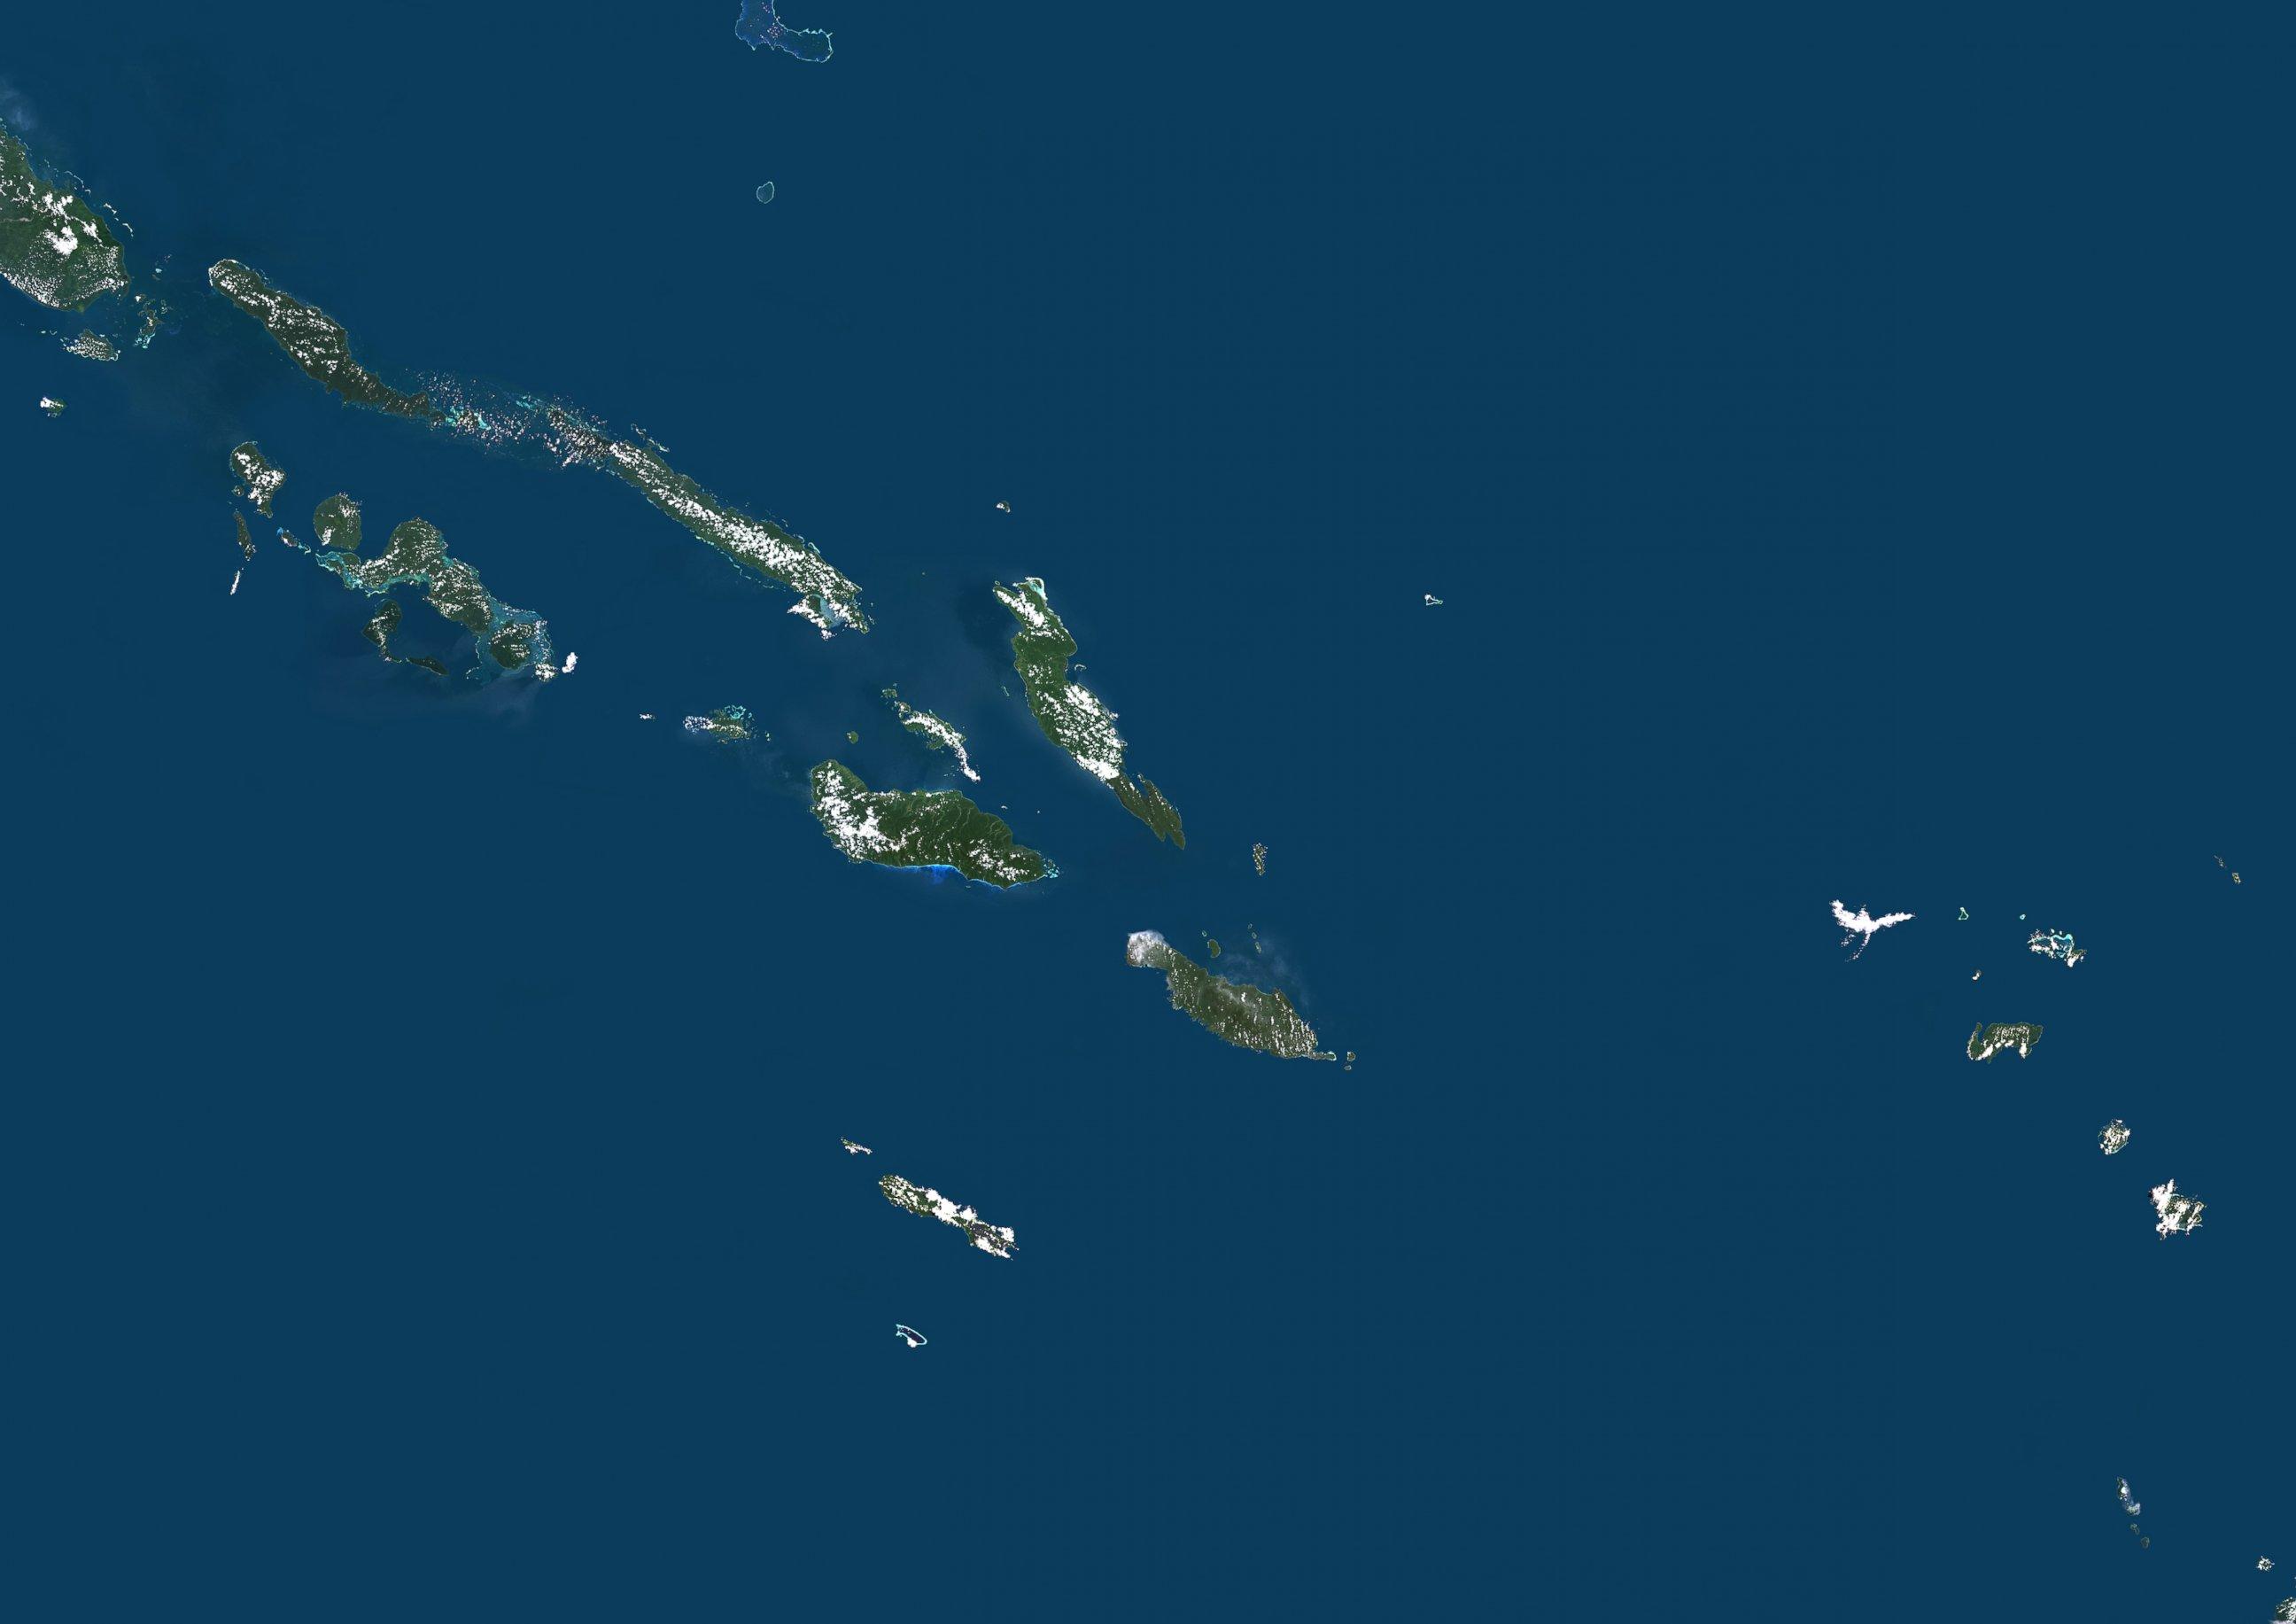 GTY_Solomon_Islands_02_jrl_160509 Satellite Map Of Solomon Islands on satellite map of the gambia, satellite map of qatar, satellite map of trinidad and tobago, satellite map of saipan, satellite map of anguilla, satellite map of kosovo, satellite map of iraq, satellite map of somalia, satellite map of brunei darussalam, satellite map of vatican city, satellite map of montserrat, satellite map of czech republic, satellite map of united states of america, satellite map of angola, satellite map of haiti, satellite map of iceland, satellite map of tunisia, satellite map of mali, satellite map of mauritania, satellite map of south korea,